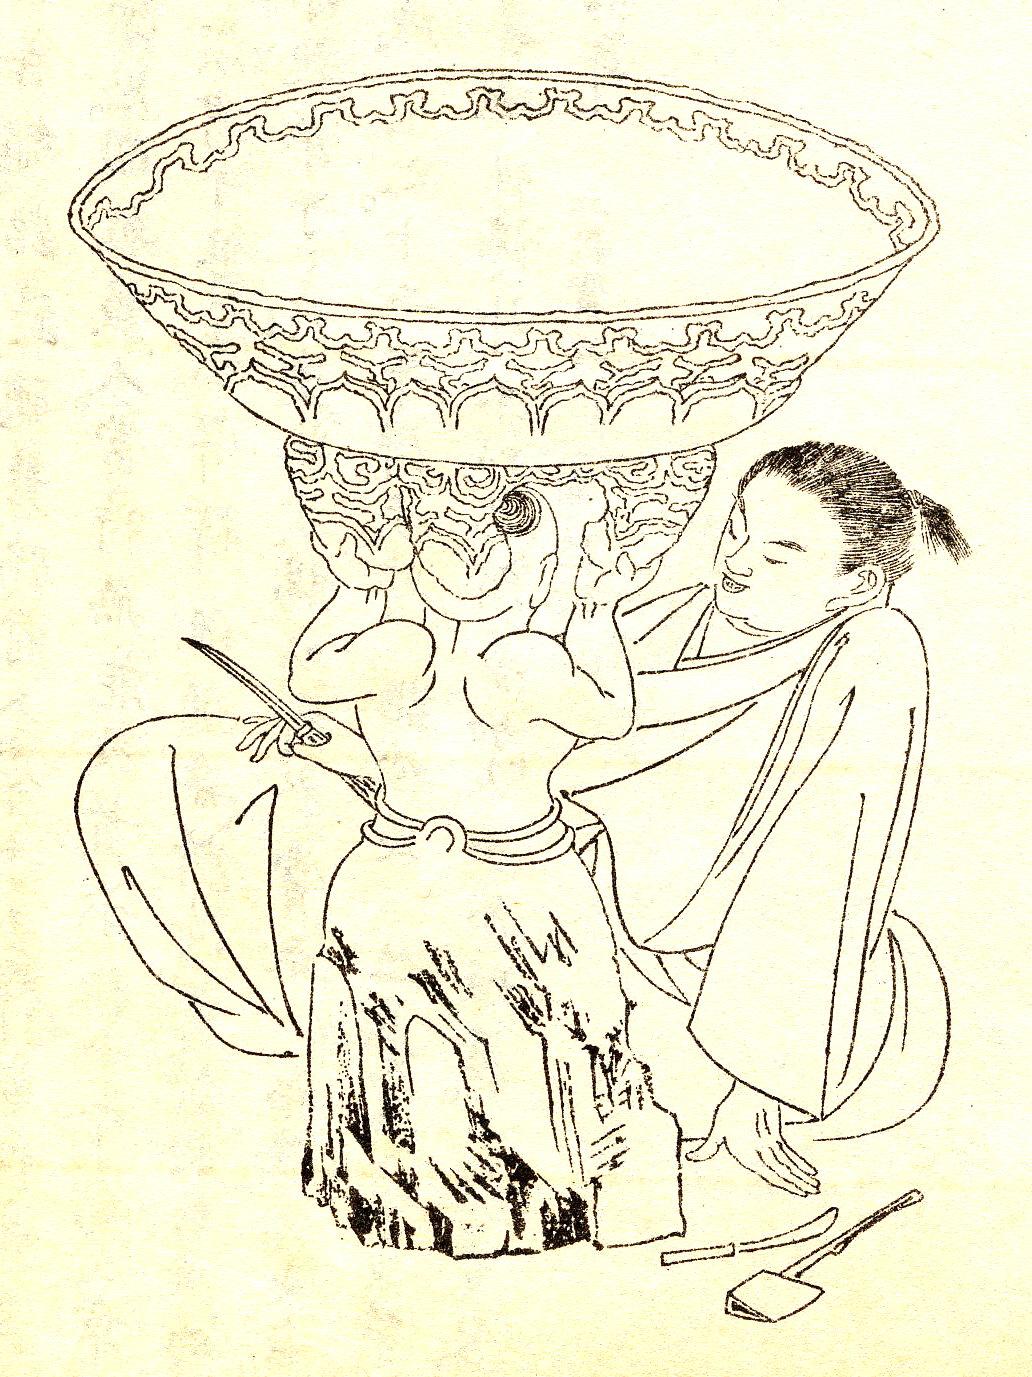 賀陽親王 - Wikipedia